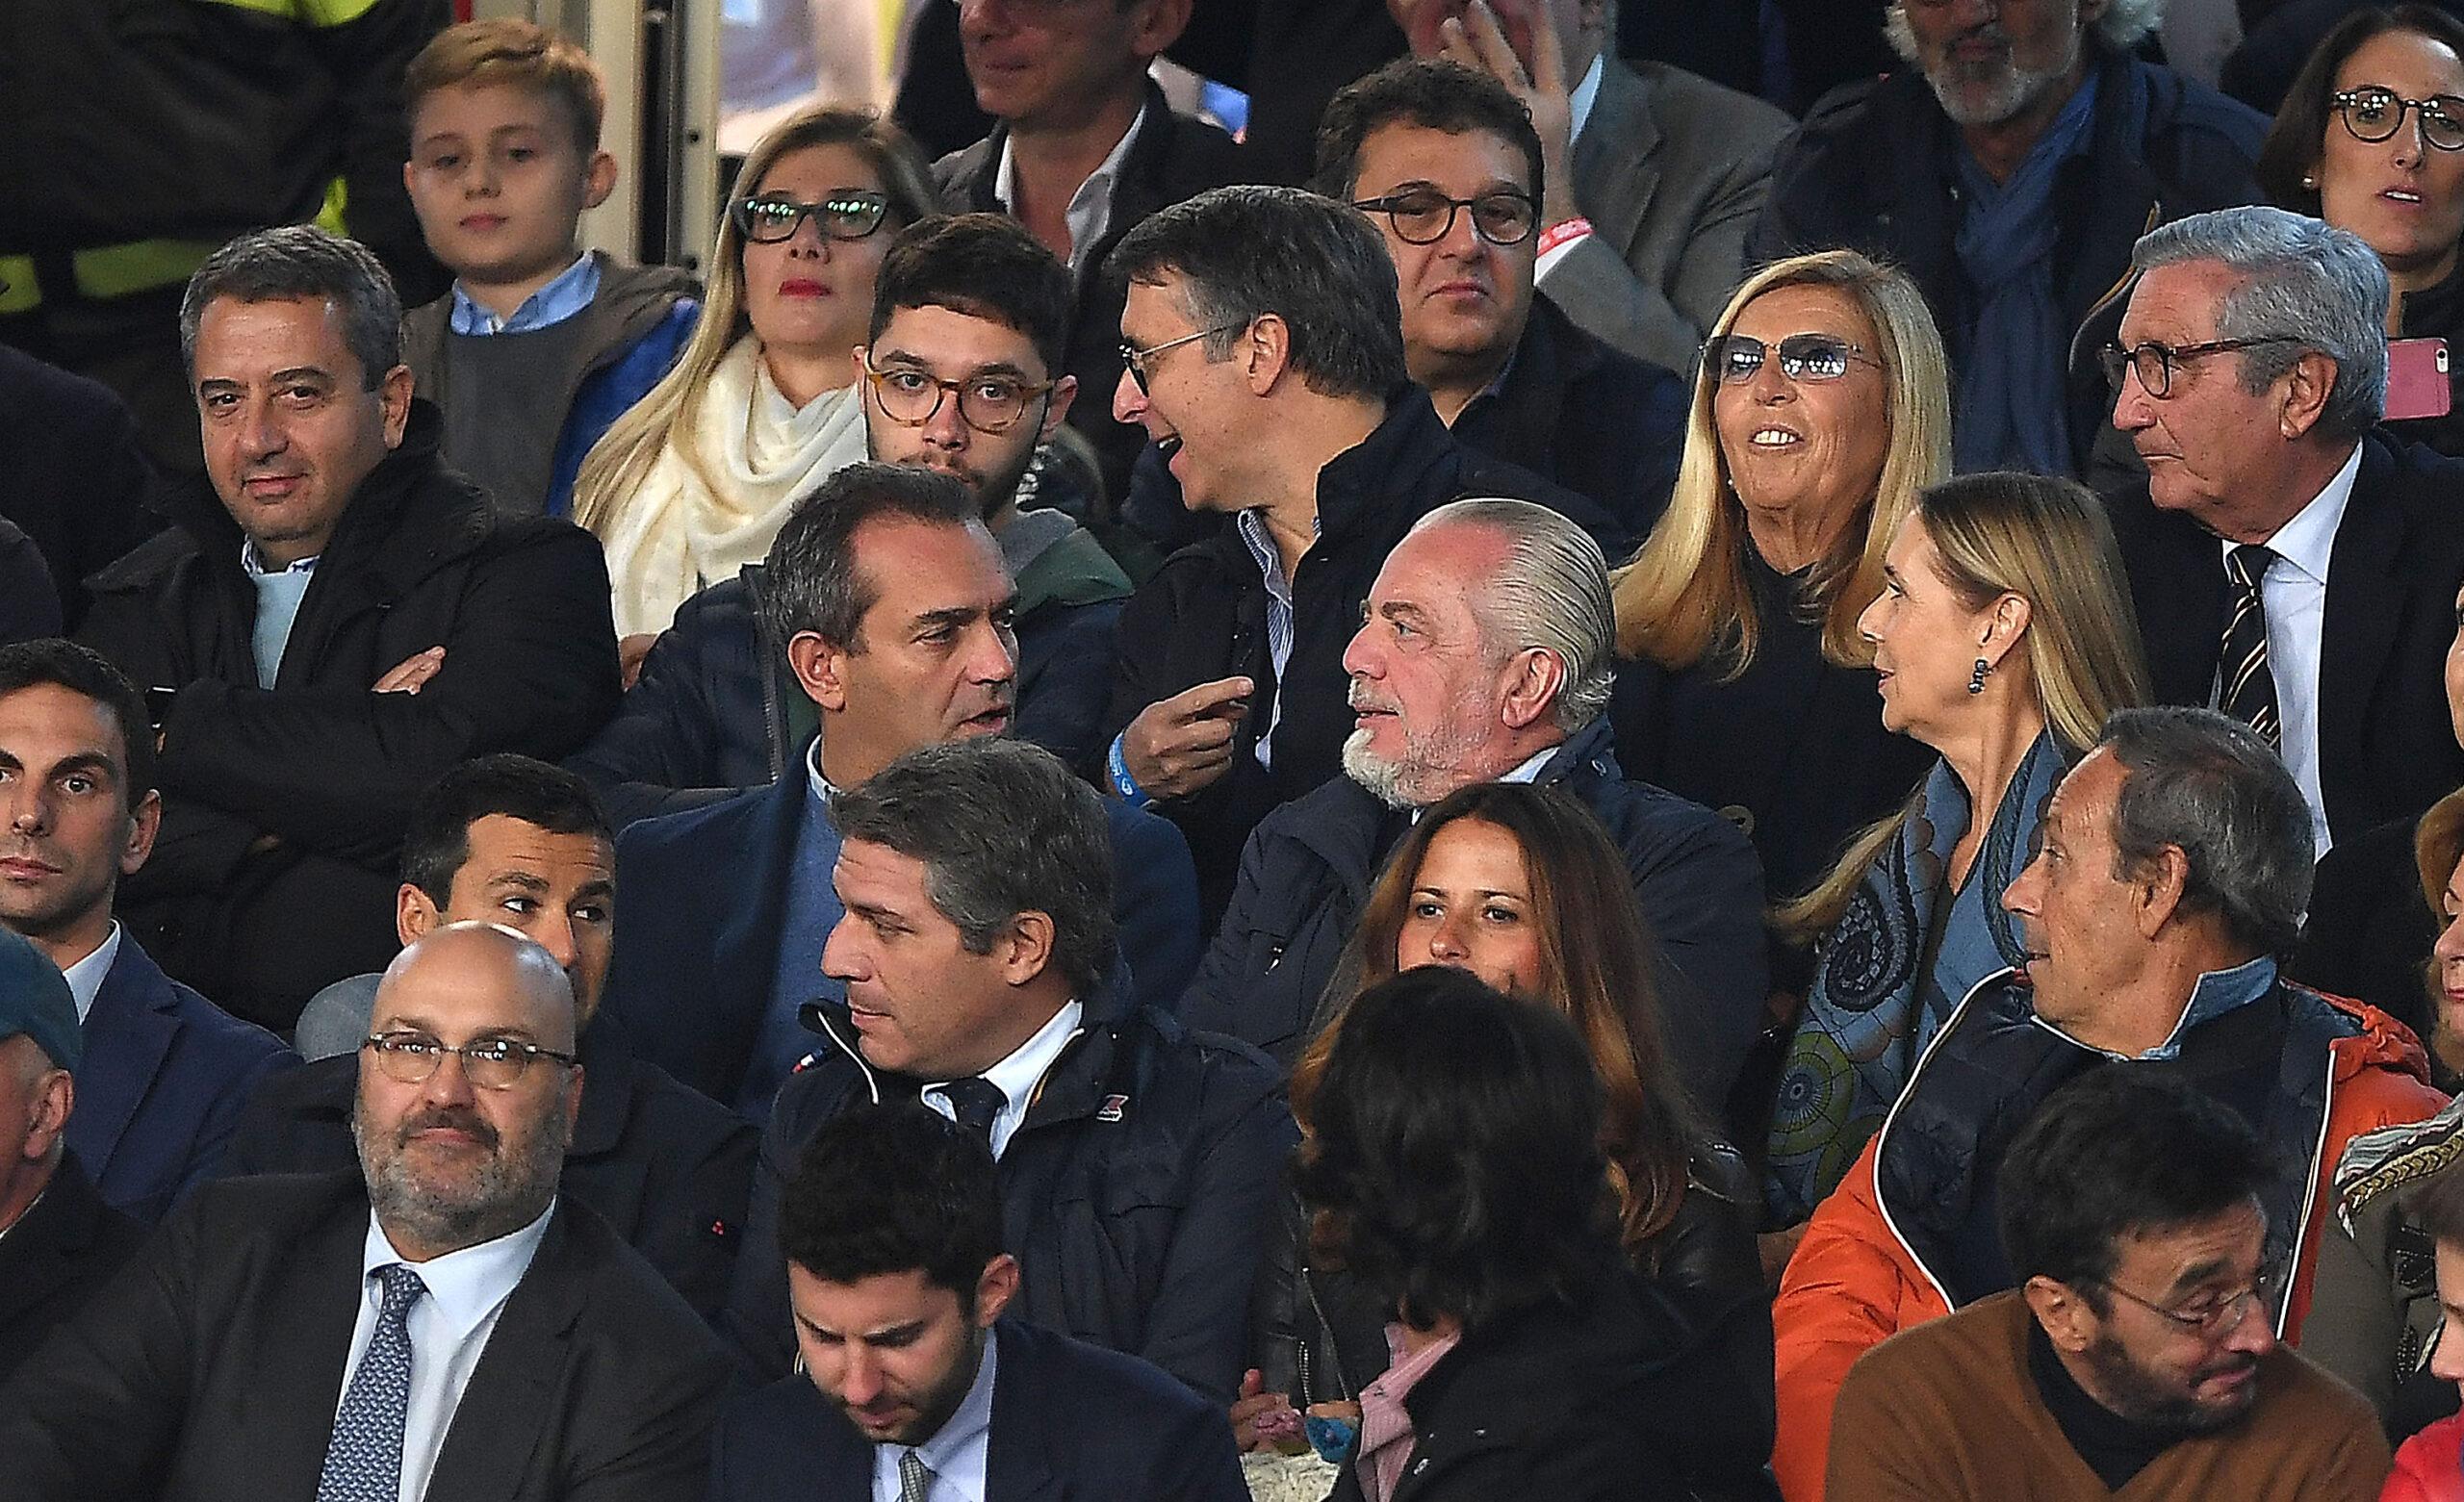 Fichaje: Presidente del Napoles afirma reunirse con Gil Marín